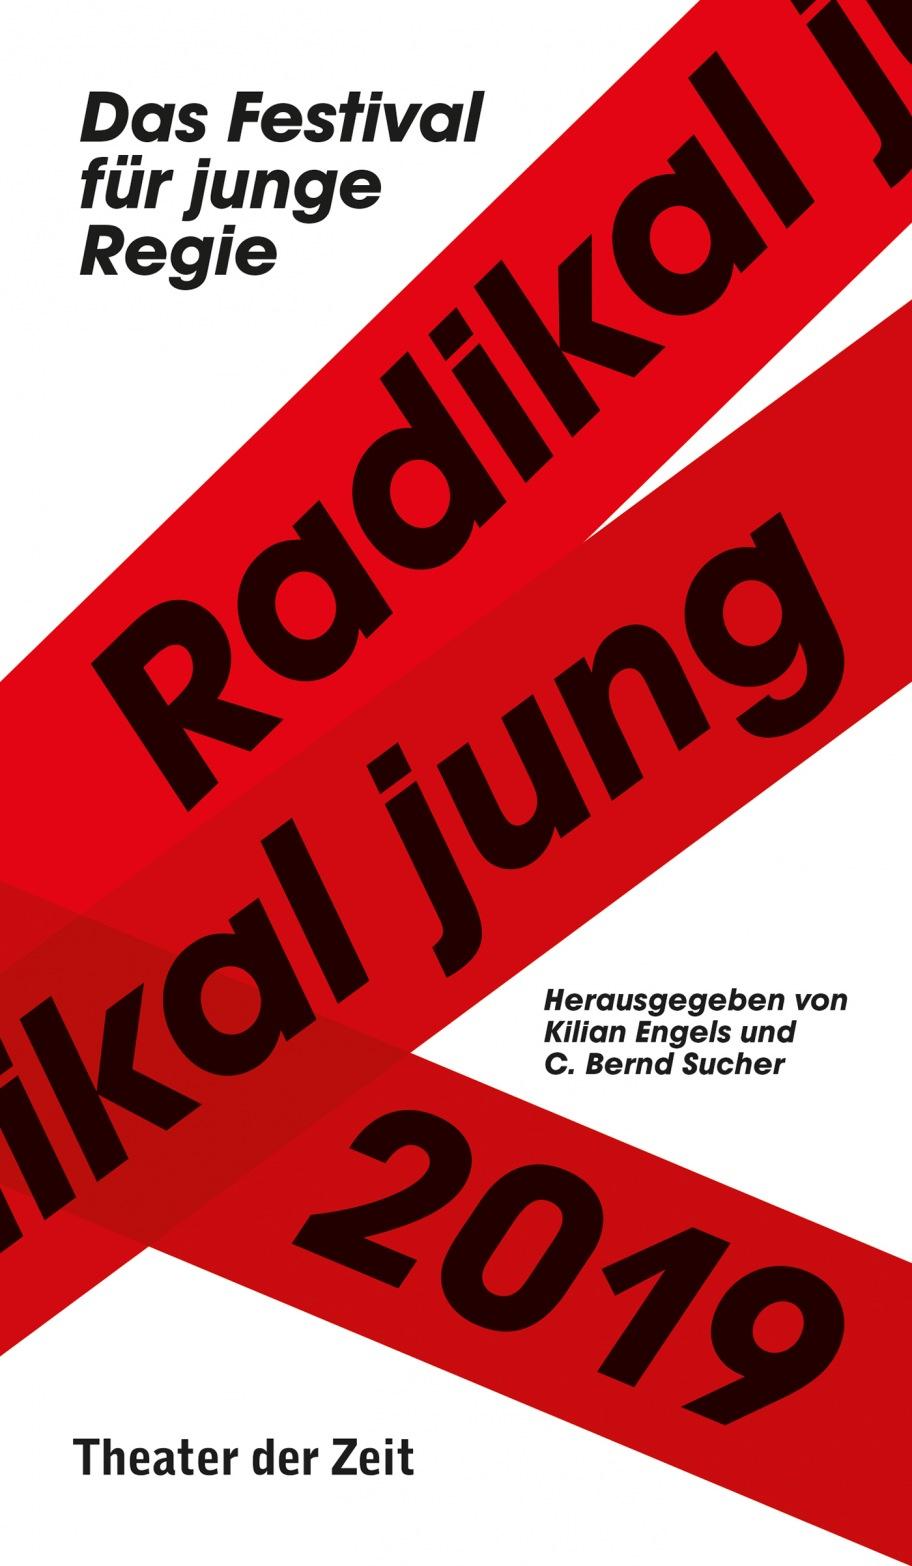 Radikal jung 2019